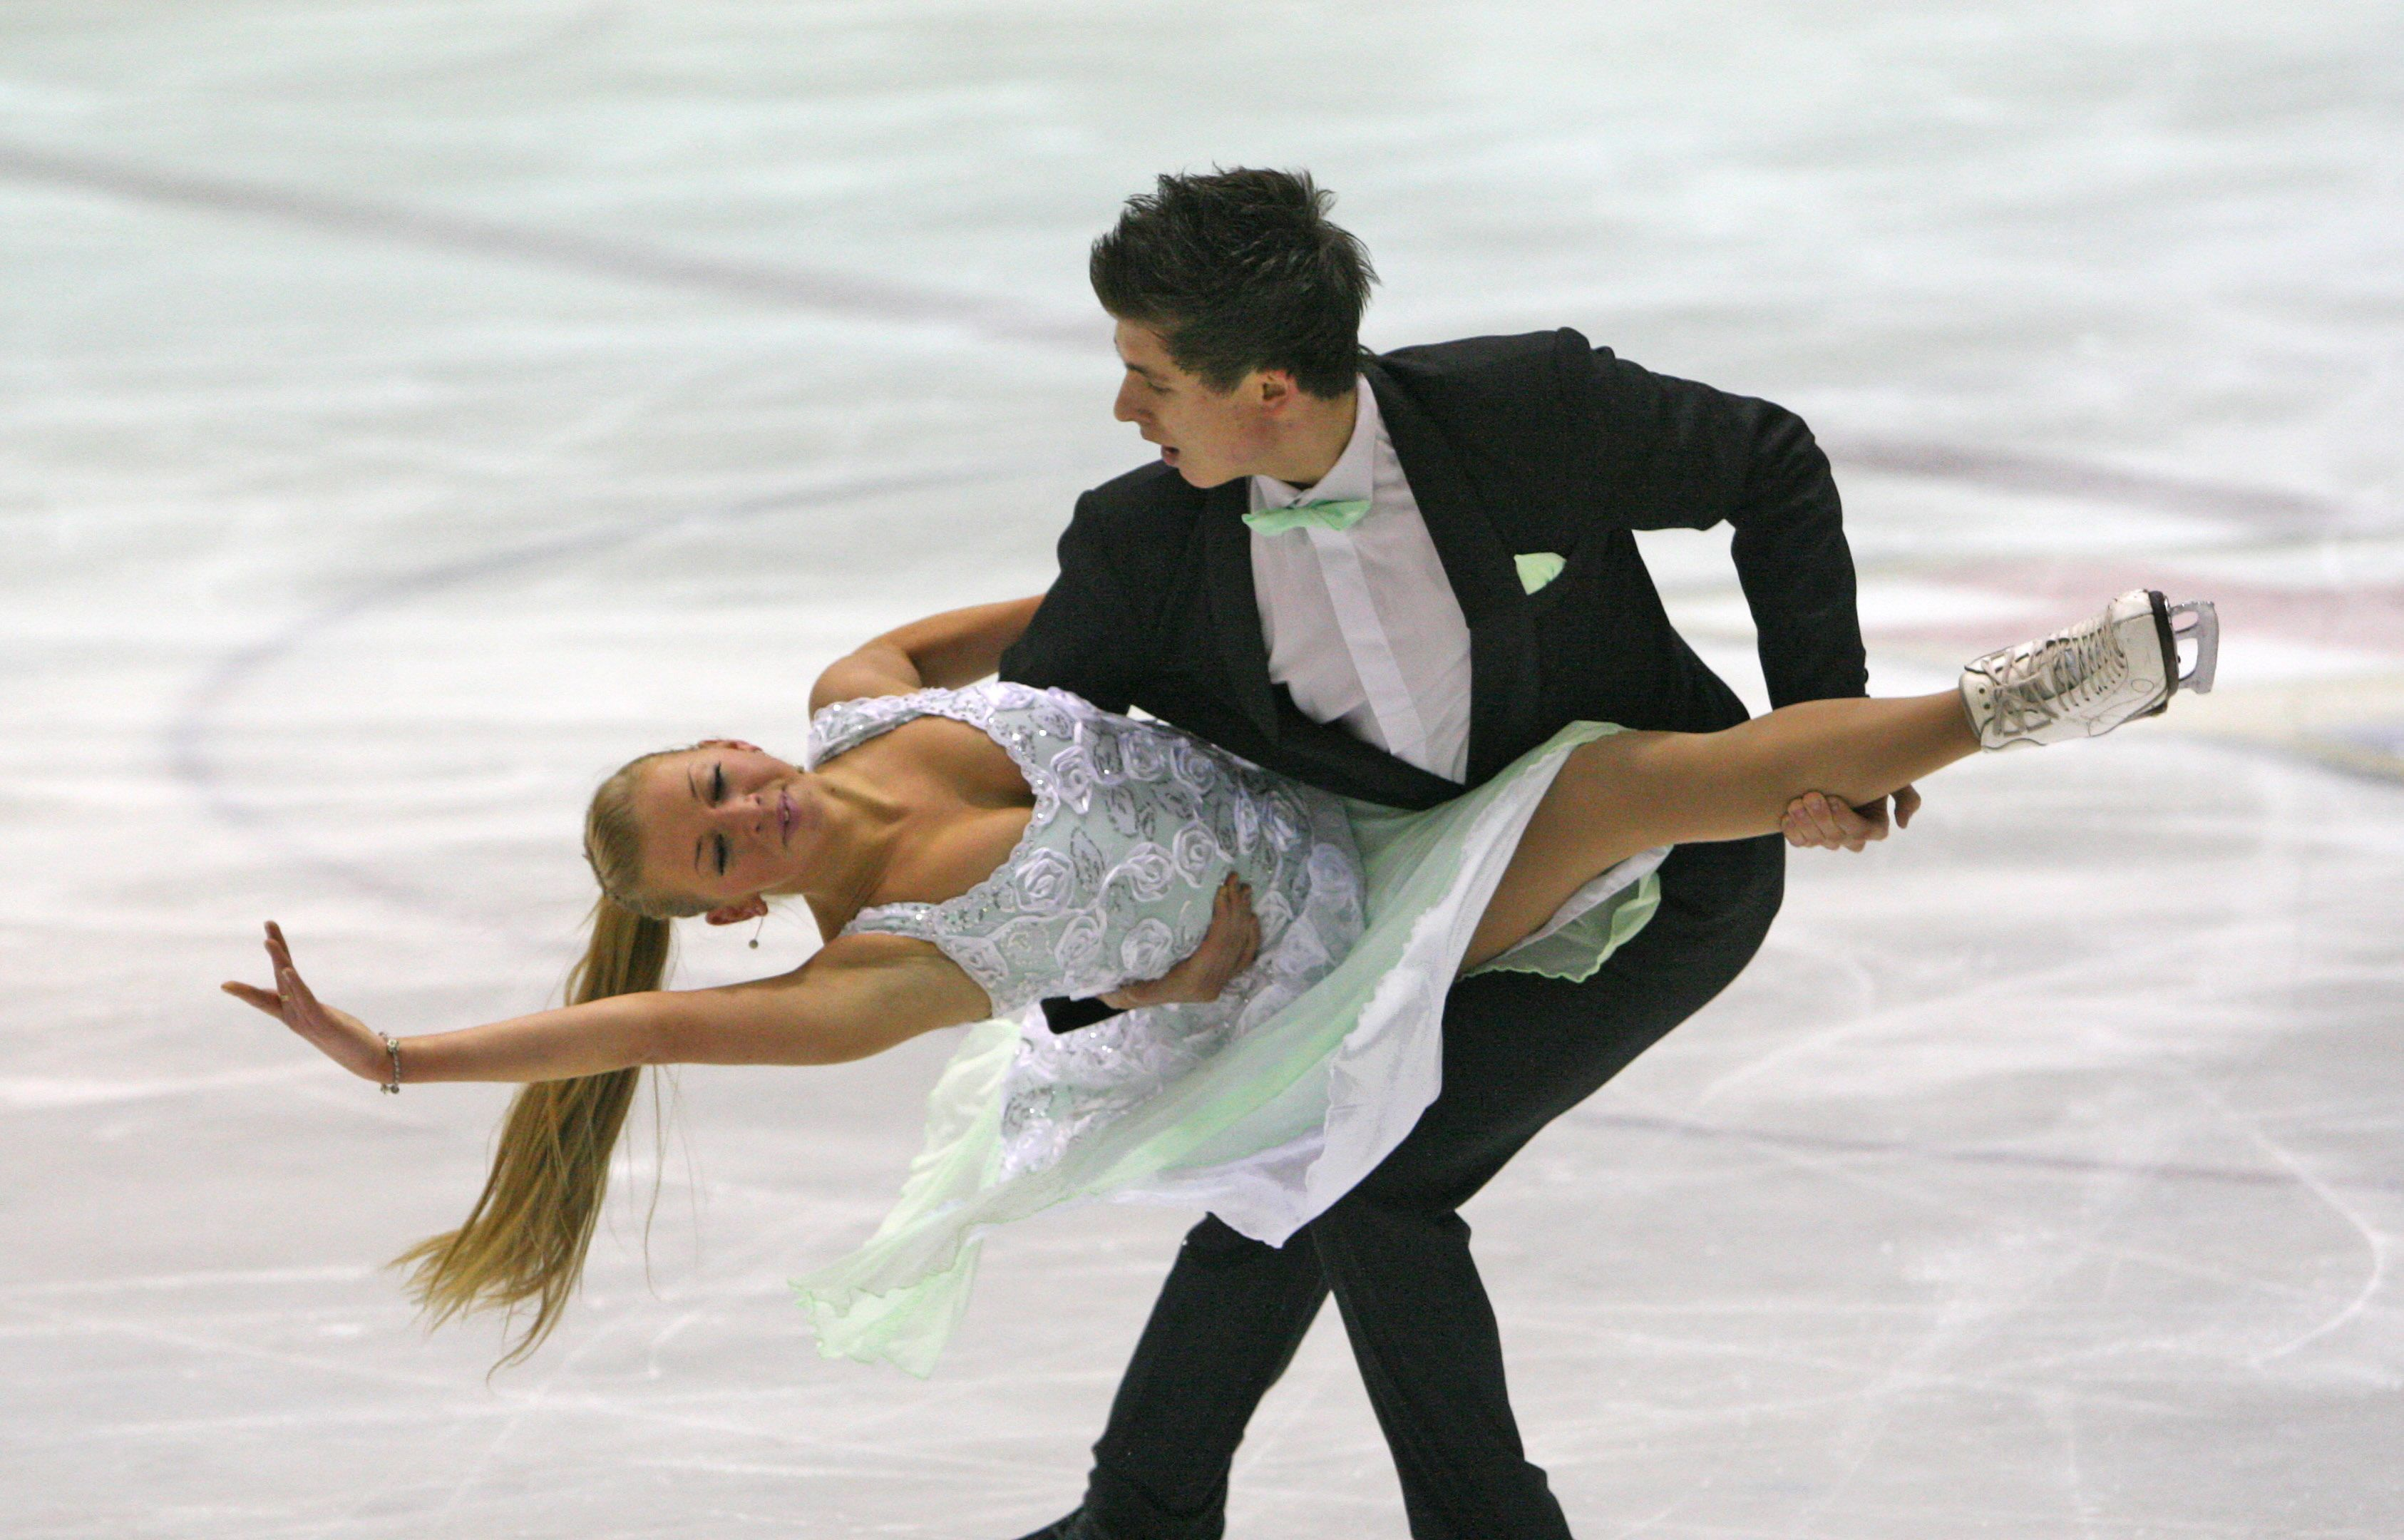 vestuario patinadores sobre hielo - Buscar con Google